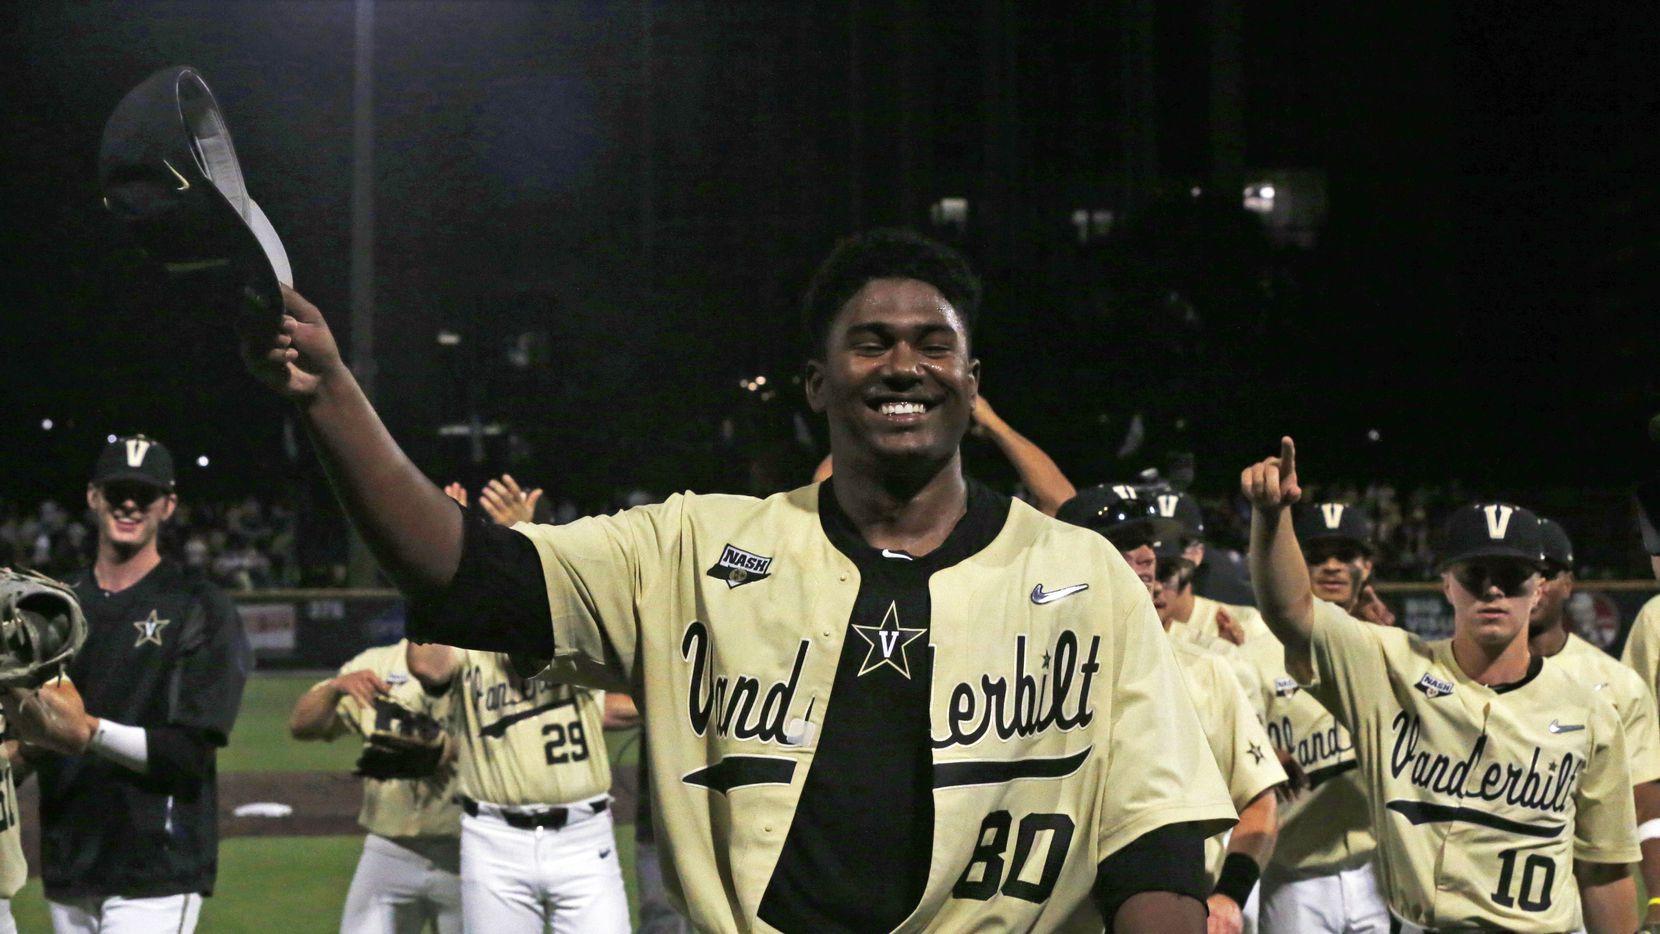 Vanderbilt's Kumar Rocker (80) tips his hat to fans after the team's NCAA college baseball tournament super regional game against Duke on Saturday, June 8, 2019, in Nashville, Tenn.